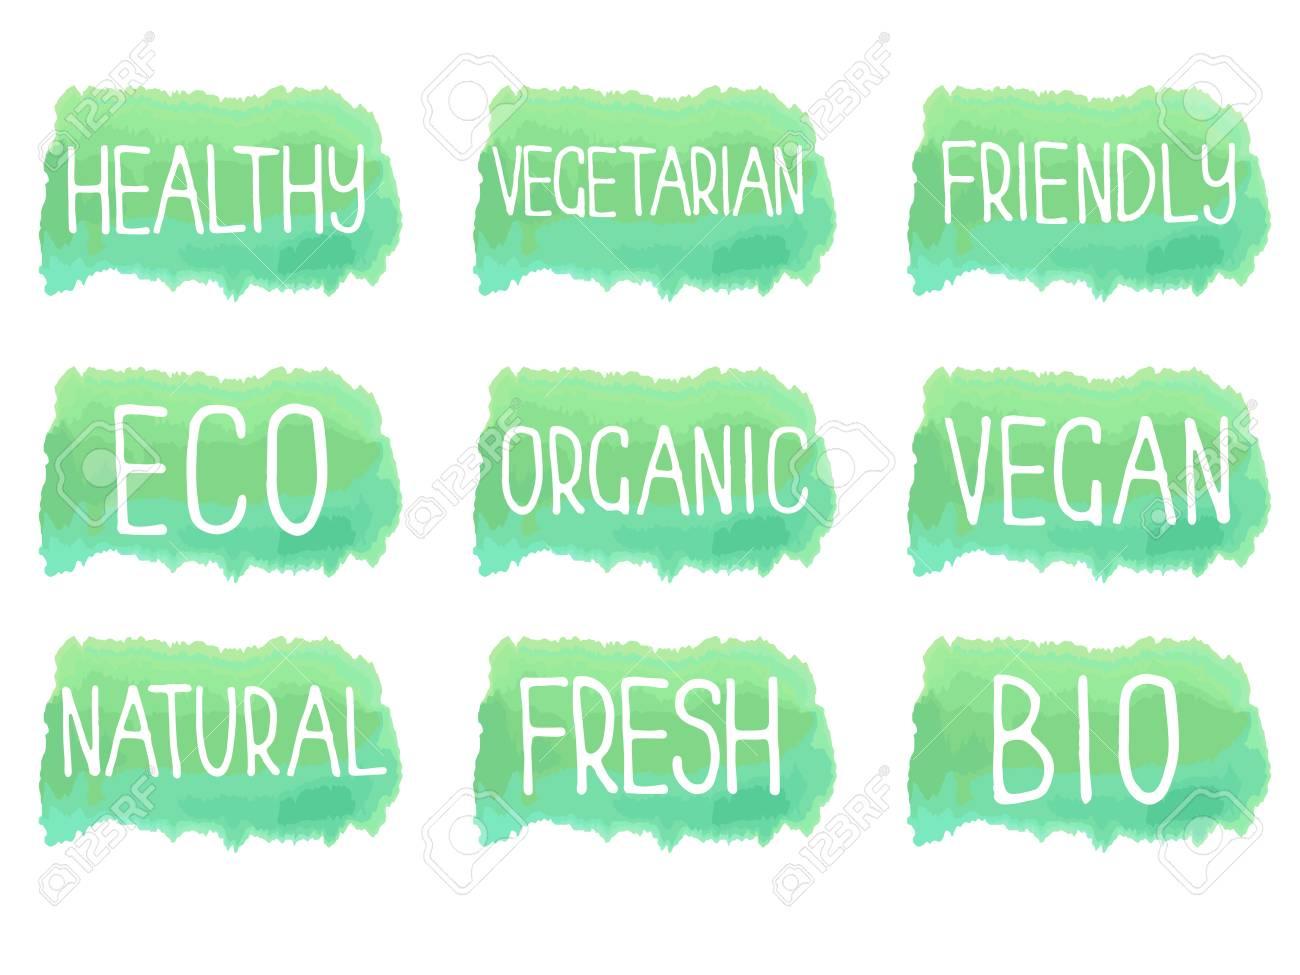 Eco Organic Bio Fresh Natural Vegan Vegetarian Gluten